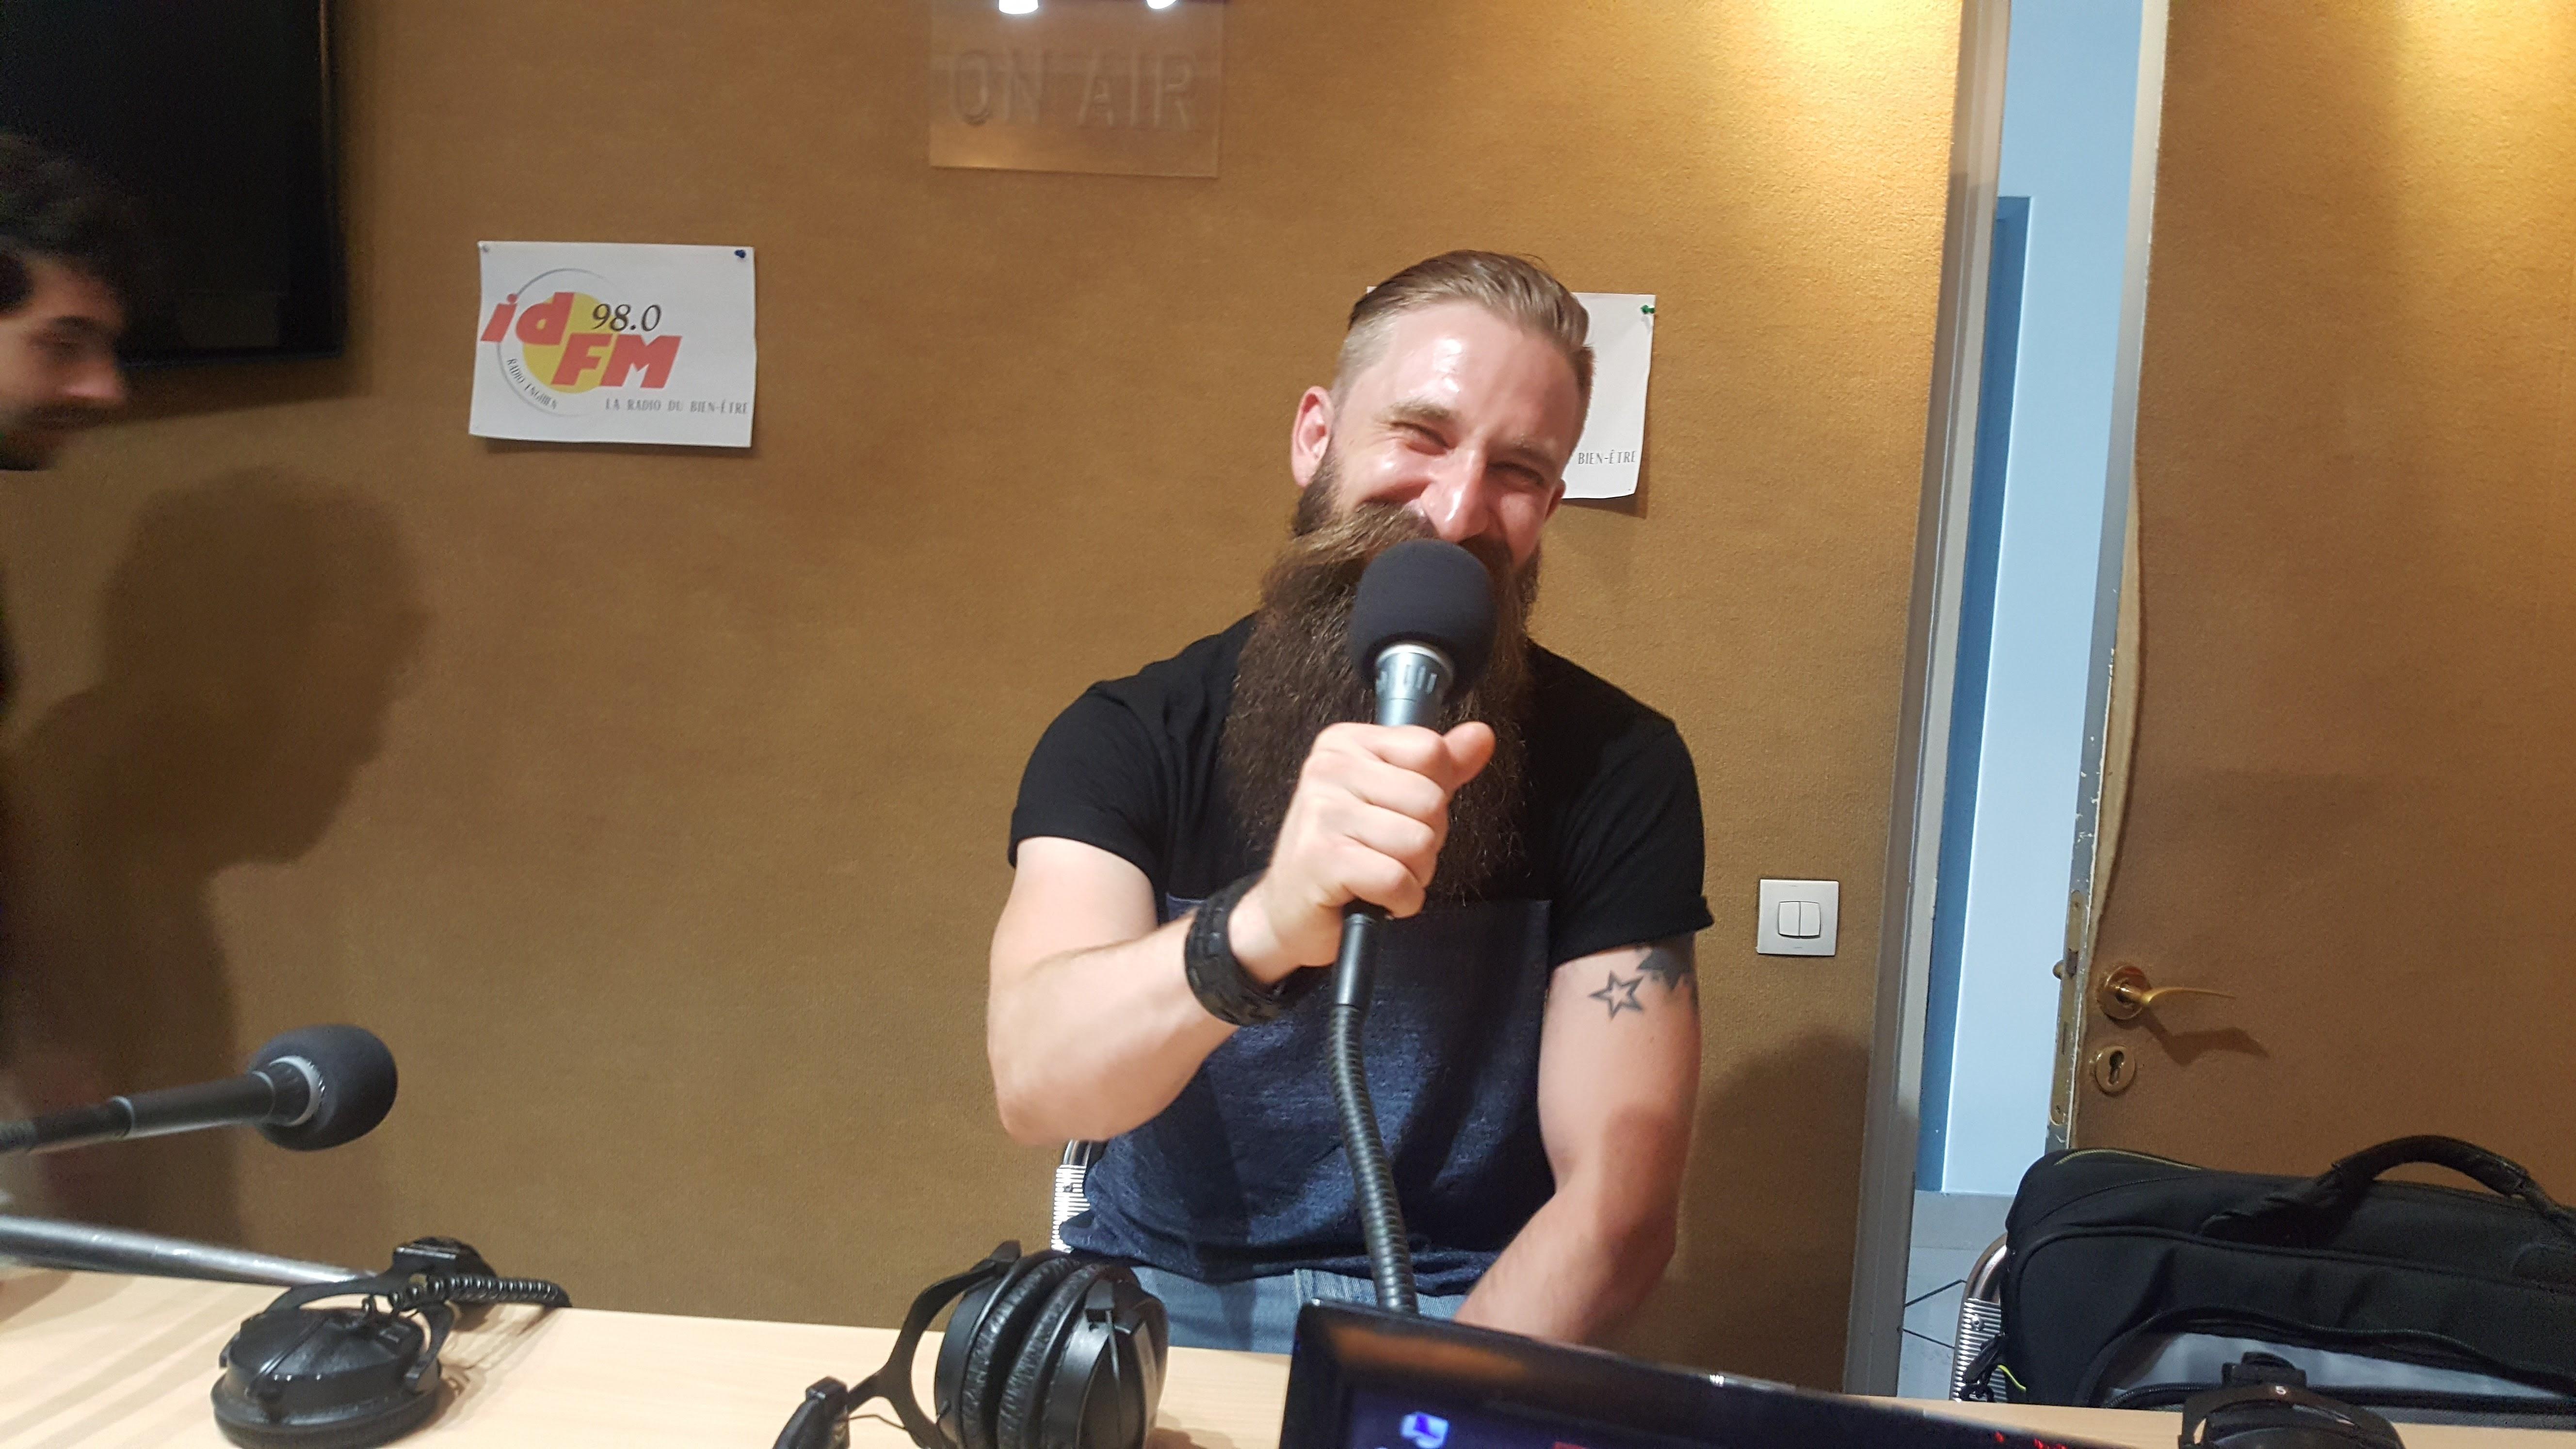 Javor Mujicic, le gagnant du concours de barbe catégorie Barbe Garibaldi